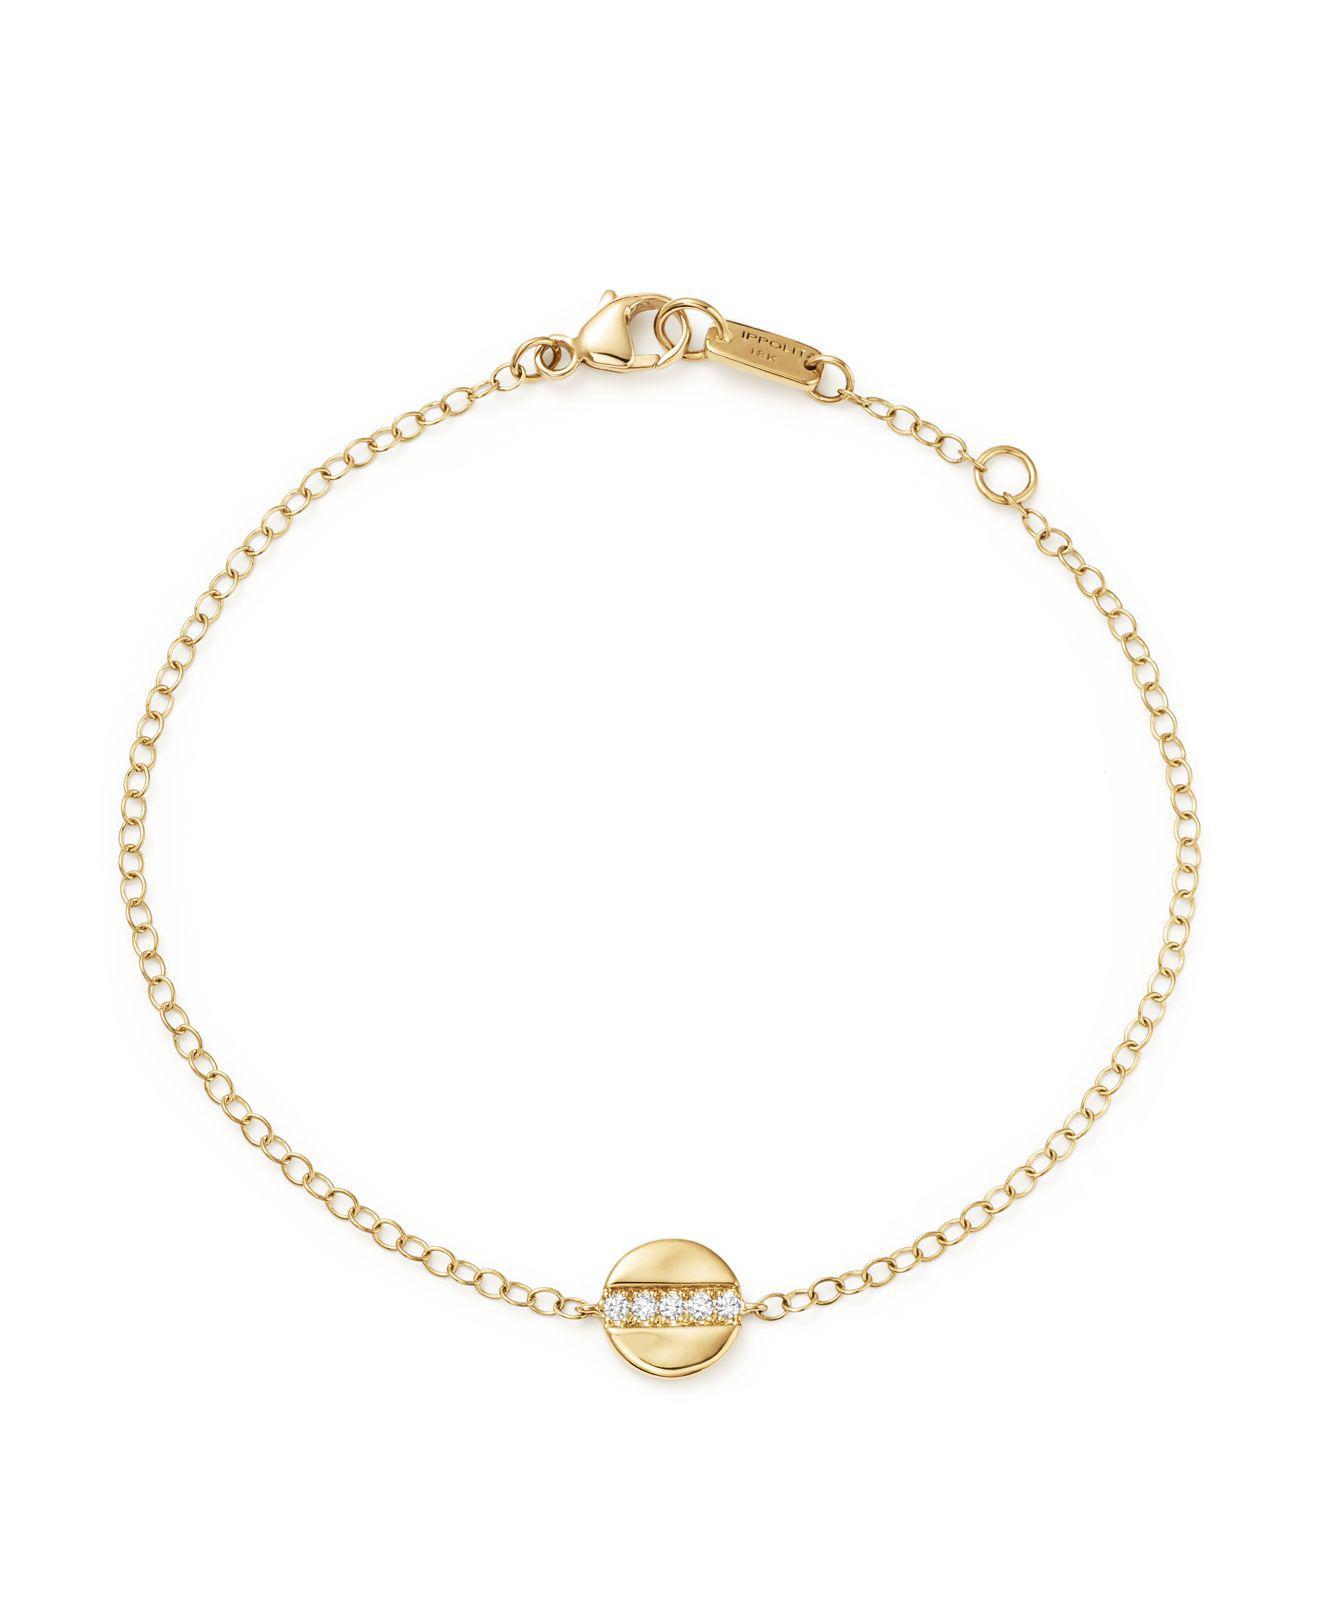 Ippolita 18K Senso Mini Disc Bracelet with Diamonds UrihmhKJi